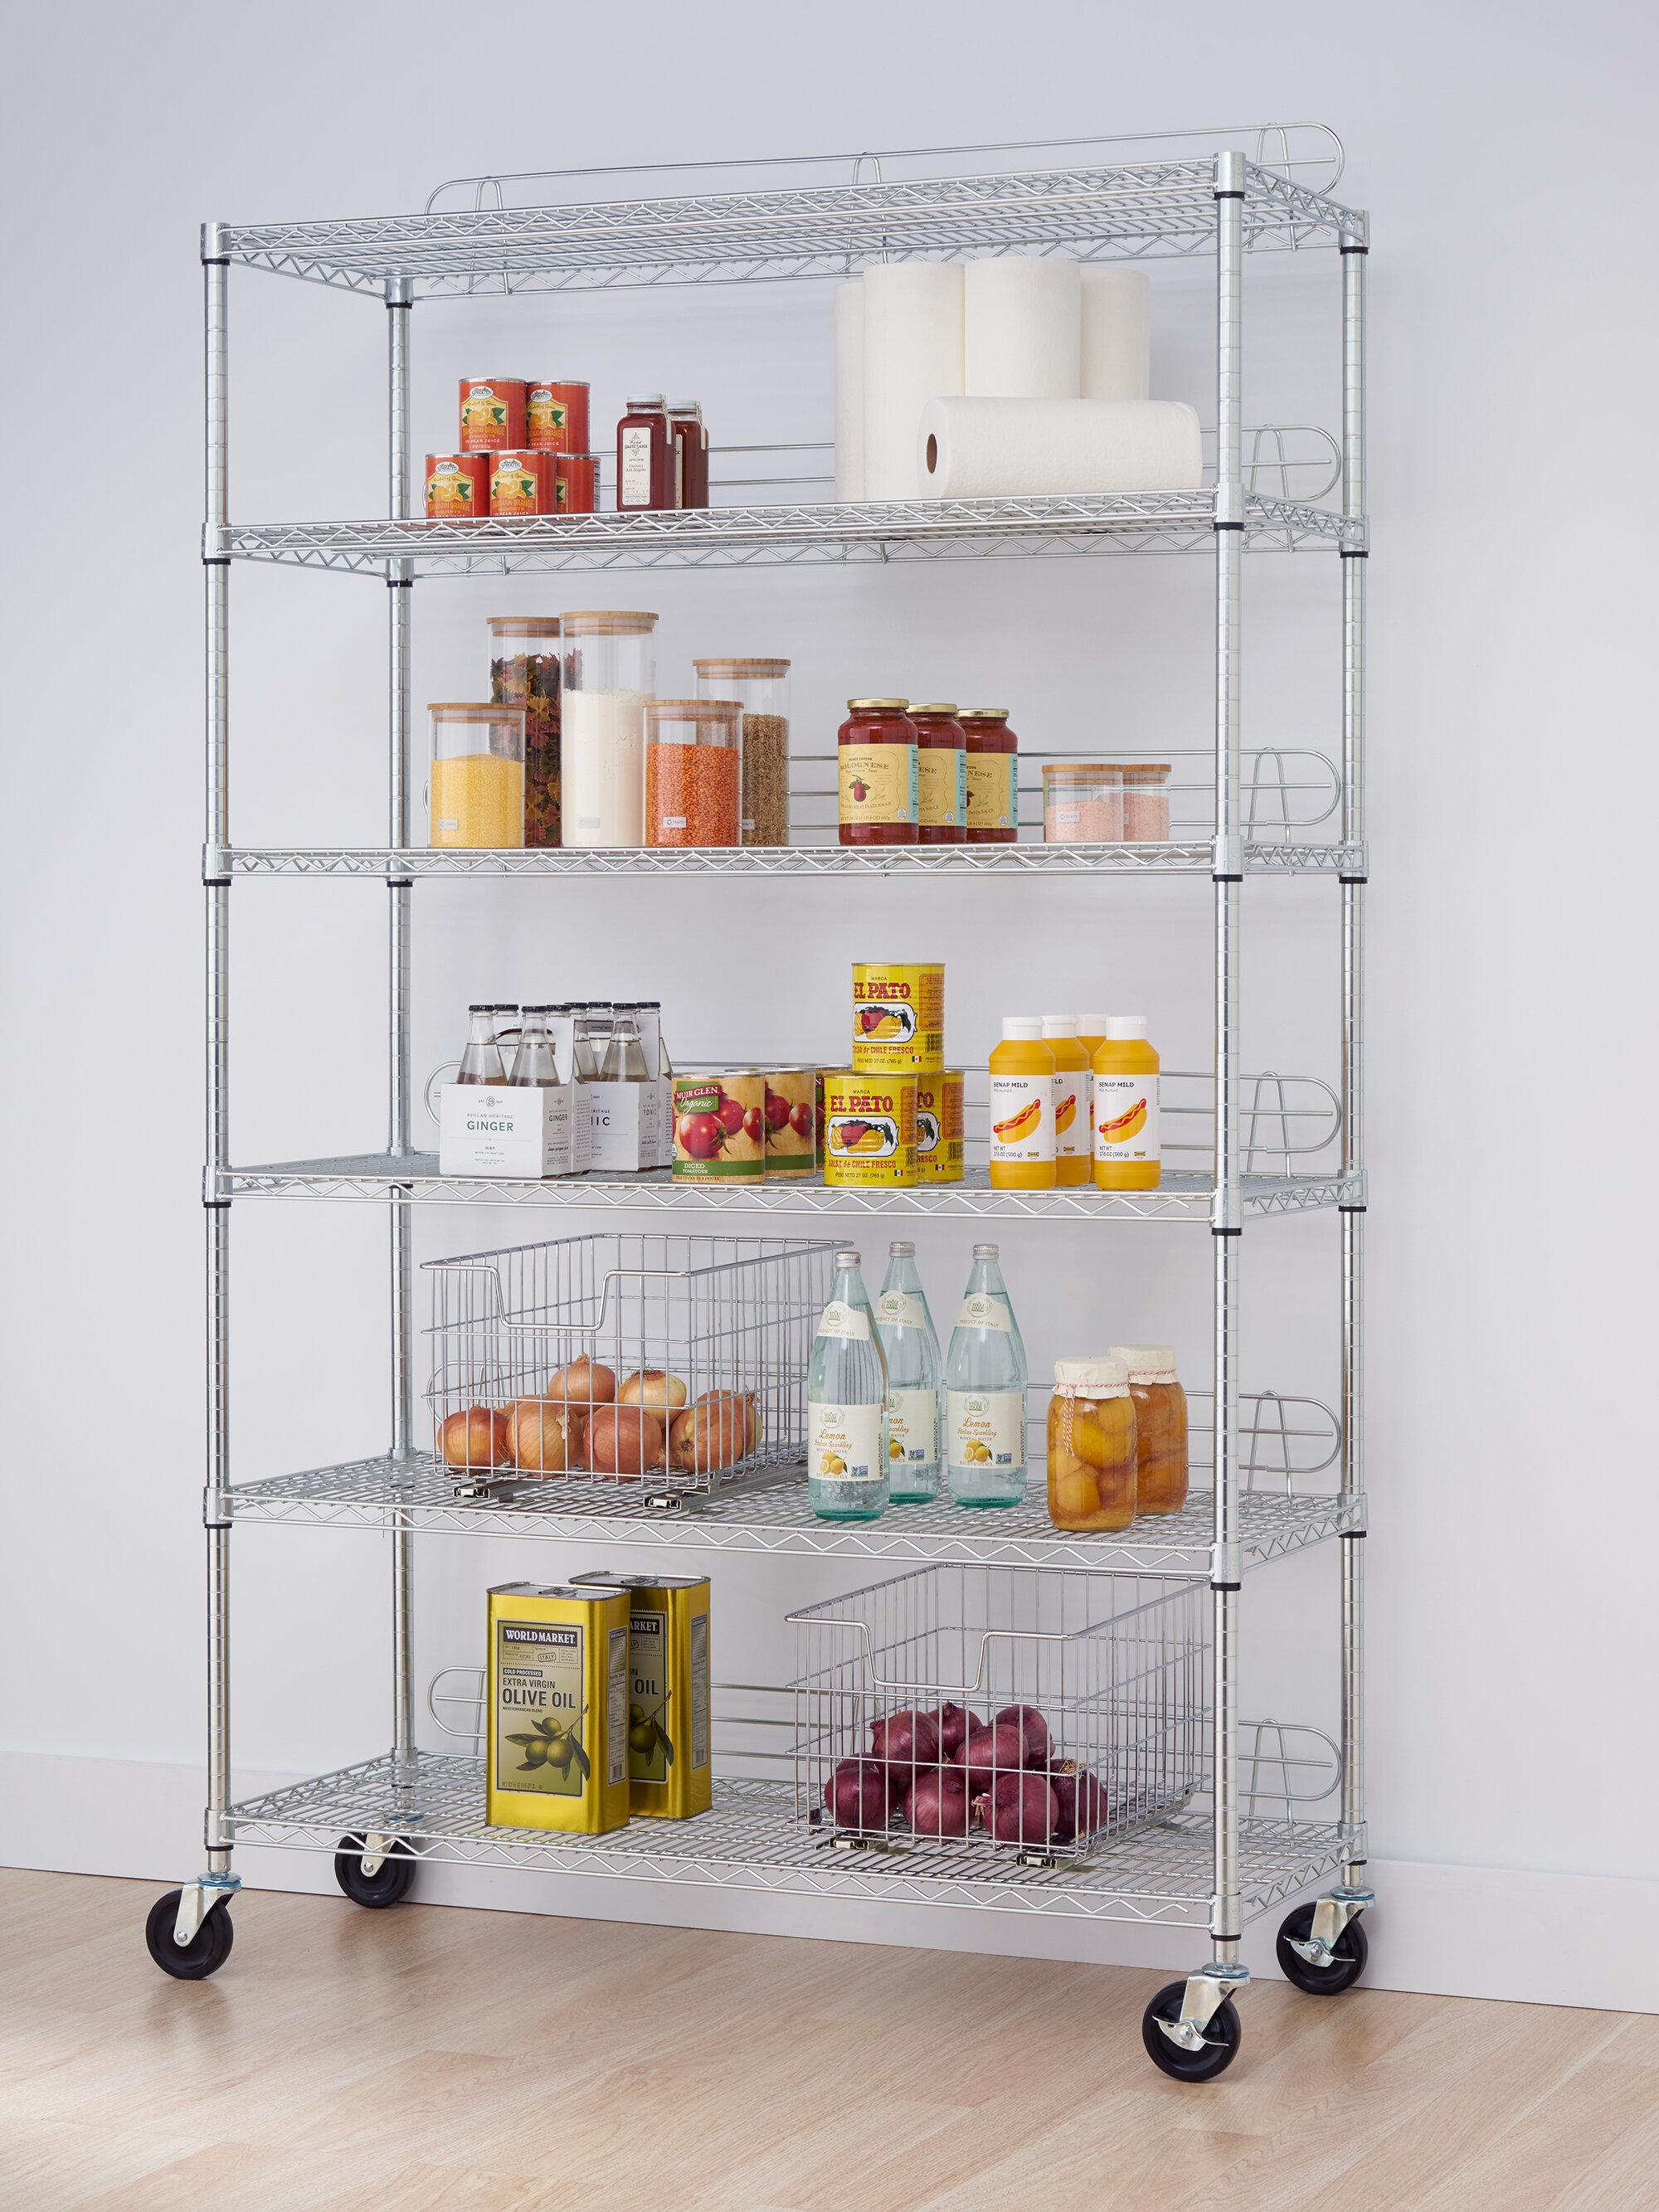 Top Image Wayfair Kitchen Shelving Units